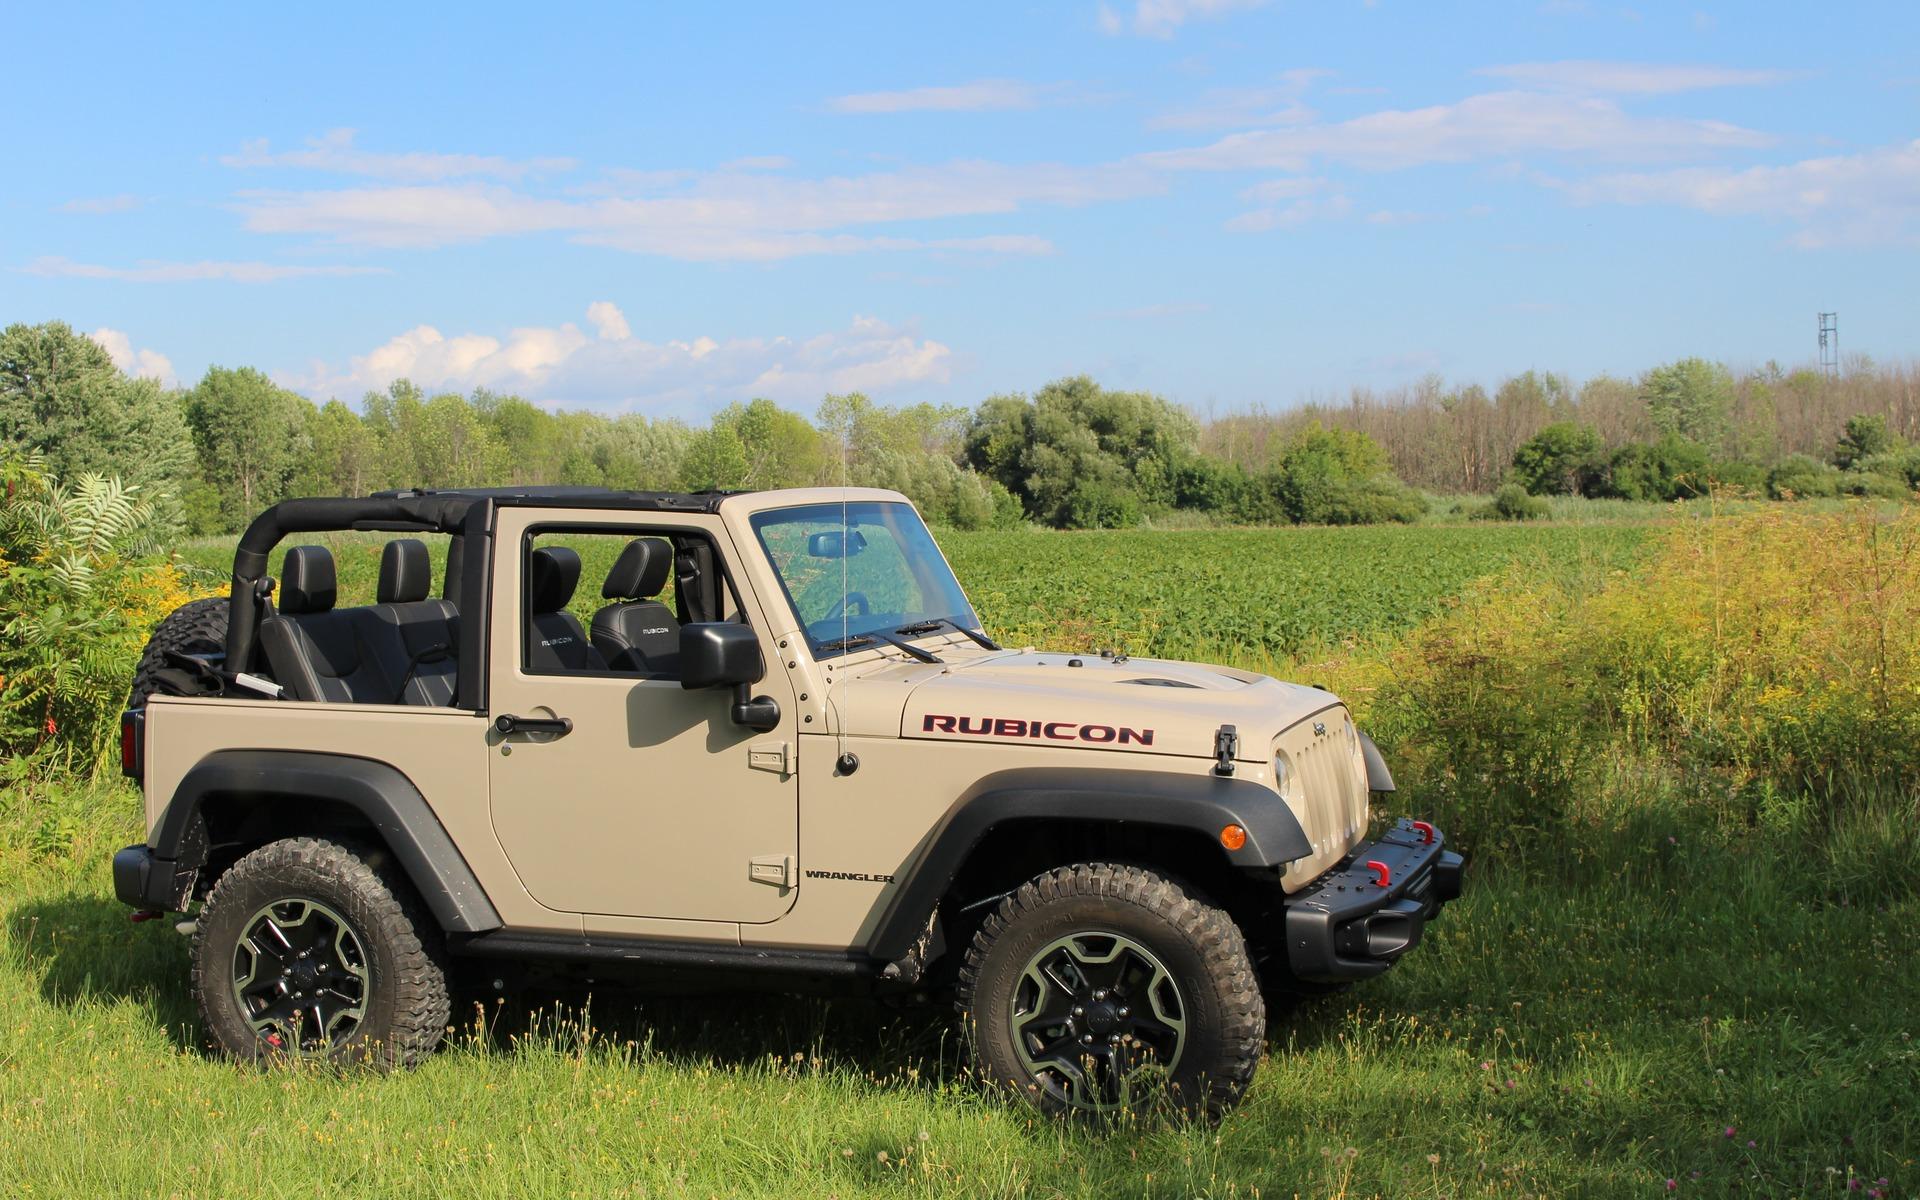 Jeep wrangler rubicon hard rock edition